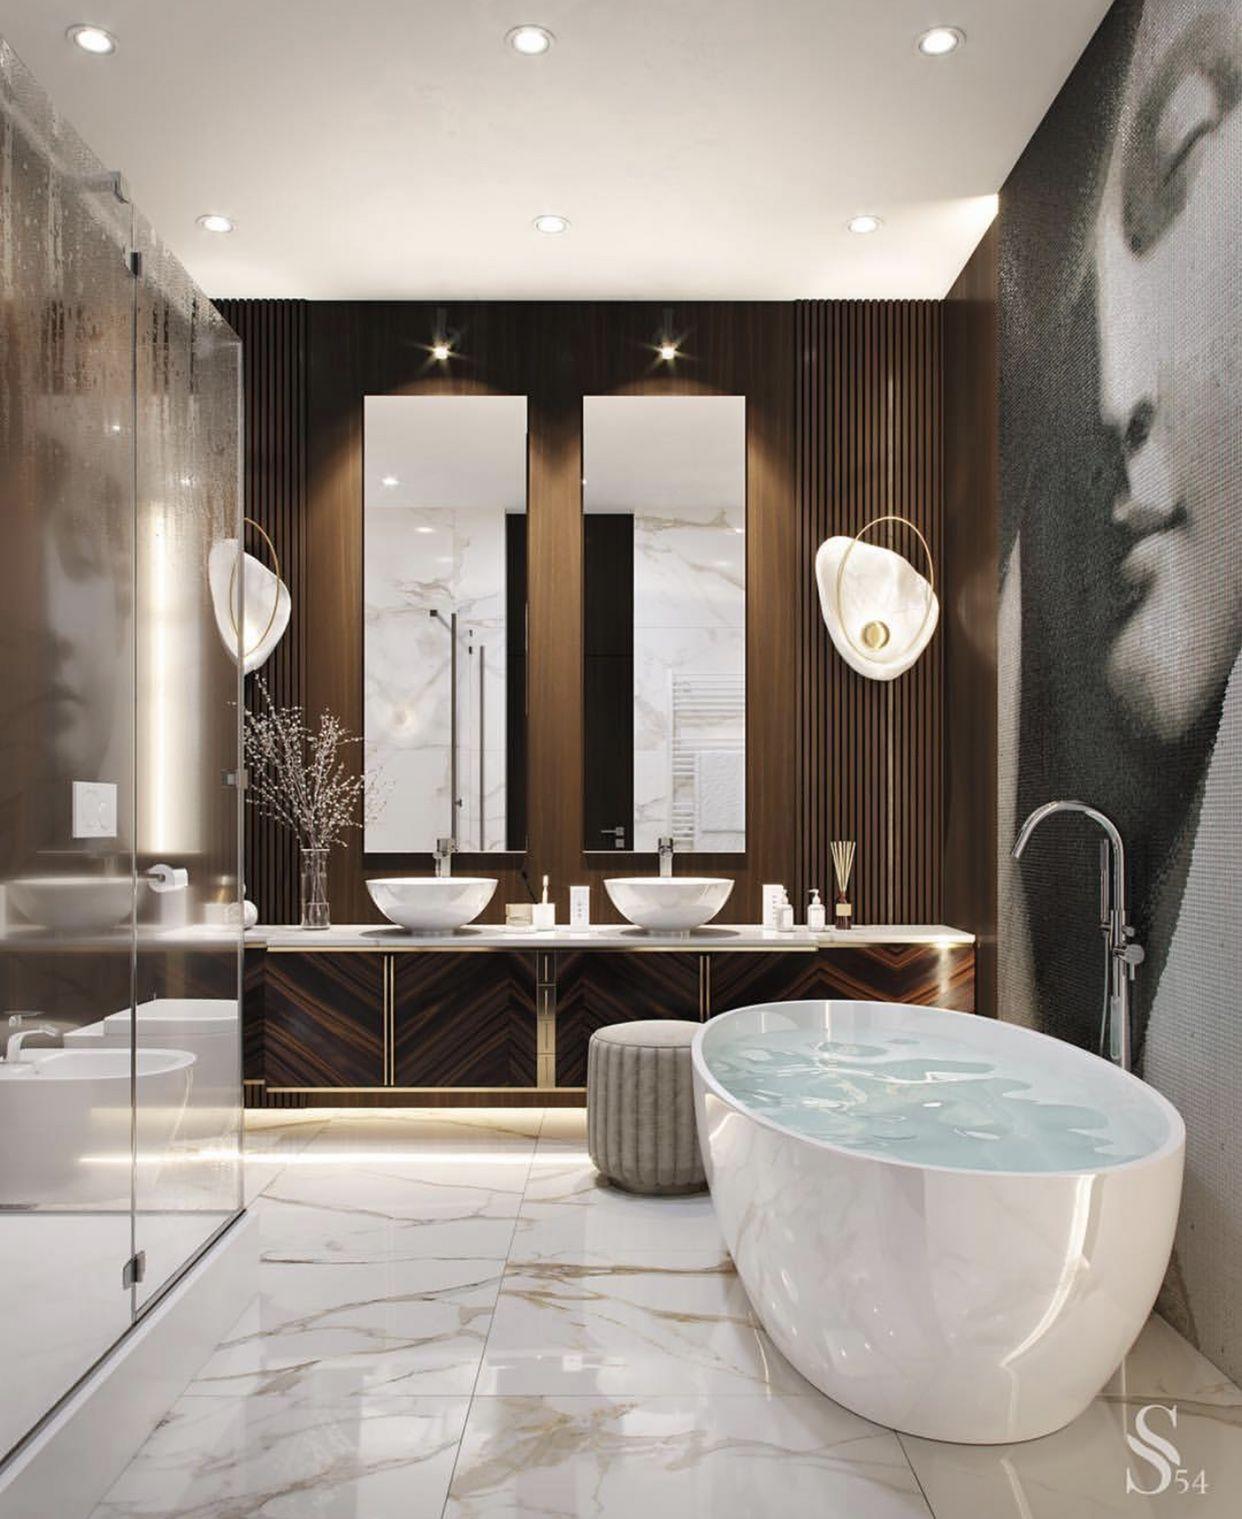 30 Glamorous Bathroom Design Ideas You Never Seen Before Glamorous Bathroom Modern Bathroom Design Bathroom Lighting Design